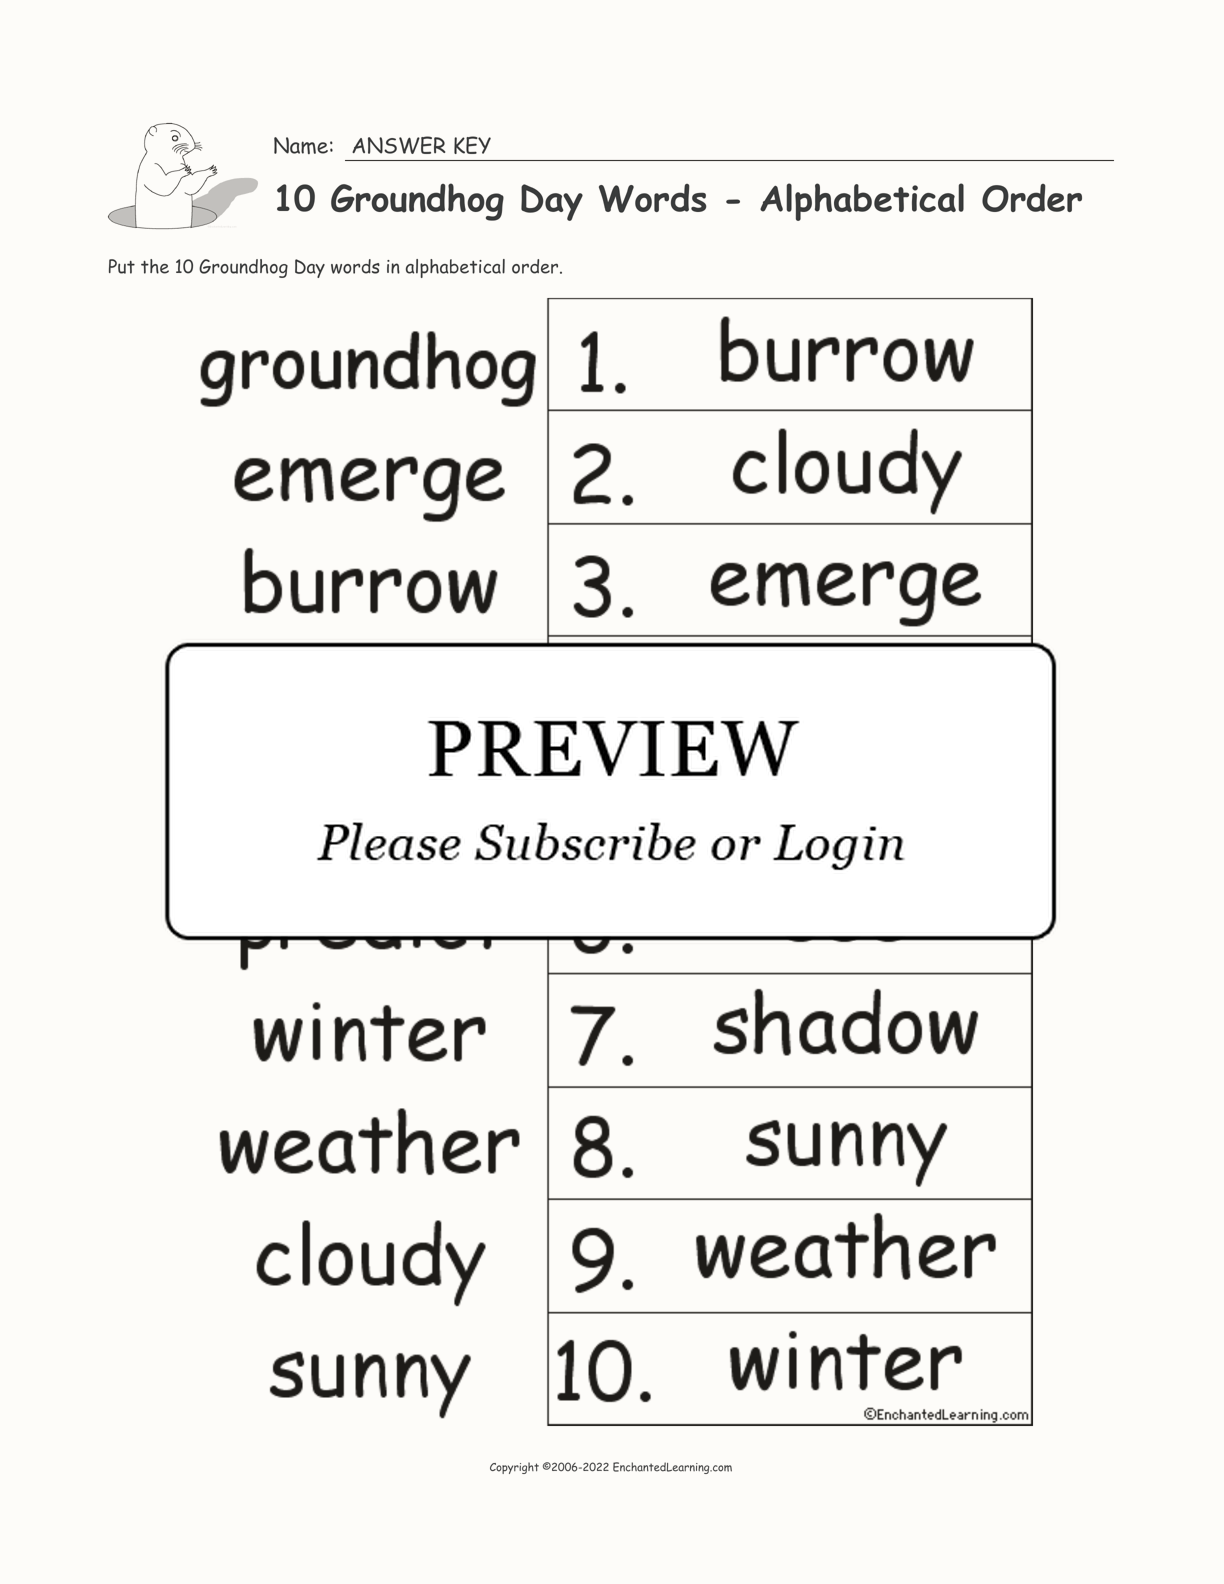 10 Groundhog Day Words